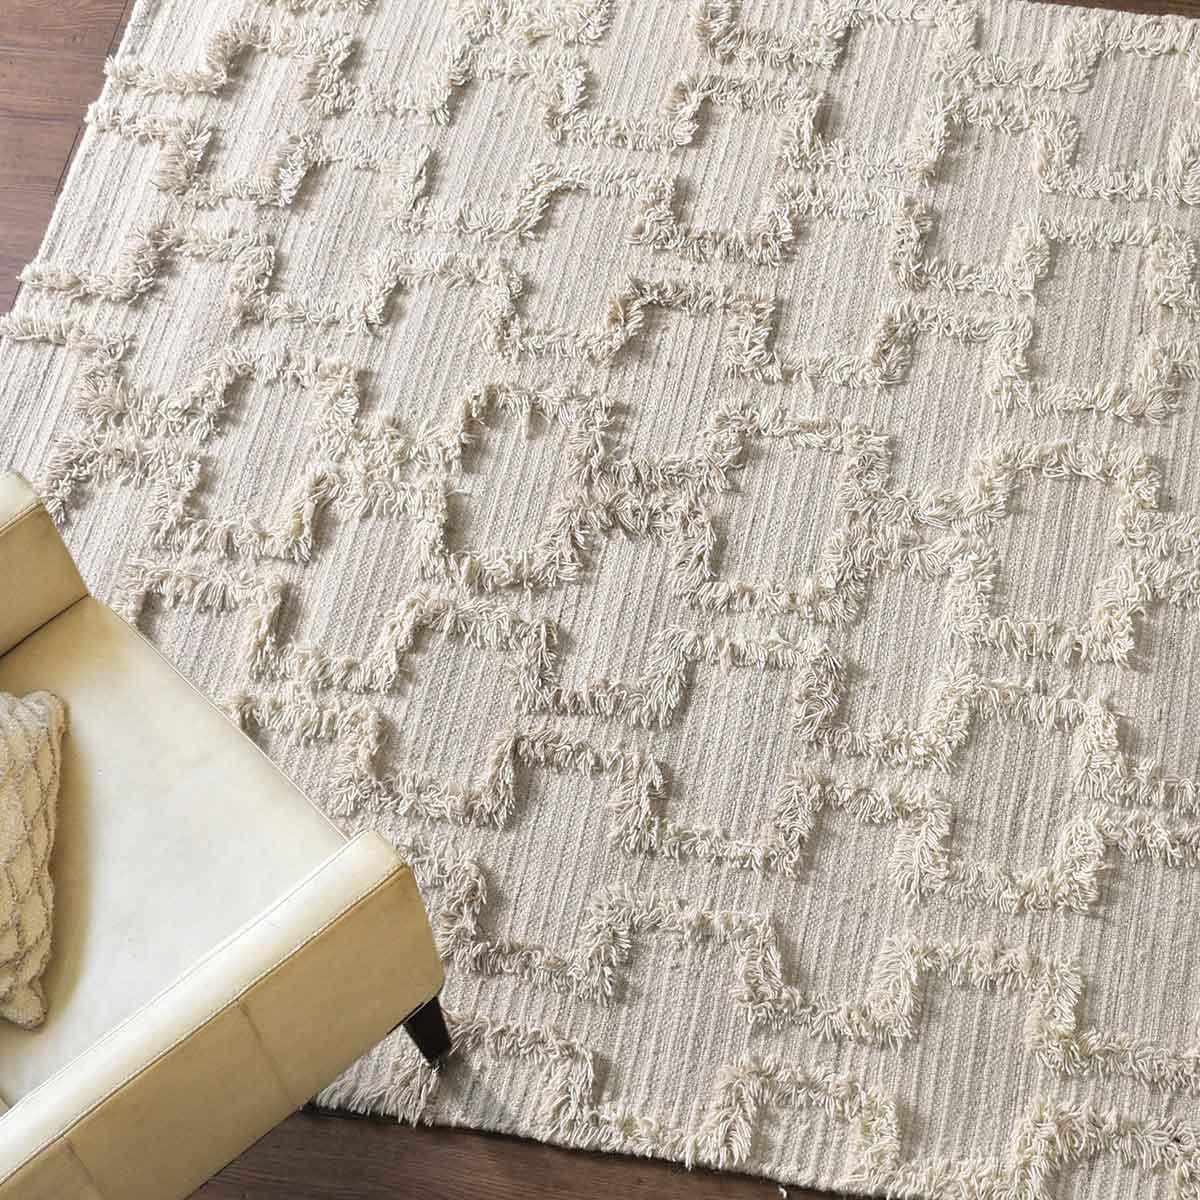 Uttermost Lapis 8 X 10 Rug - Ivory